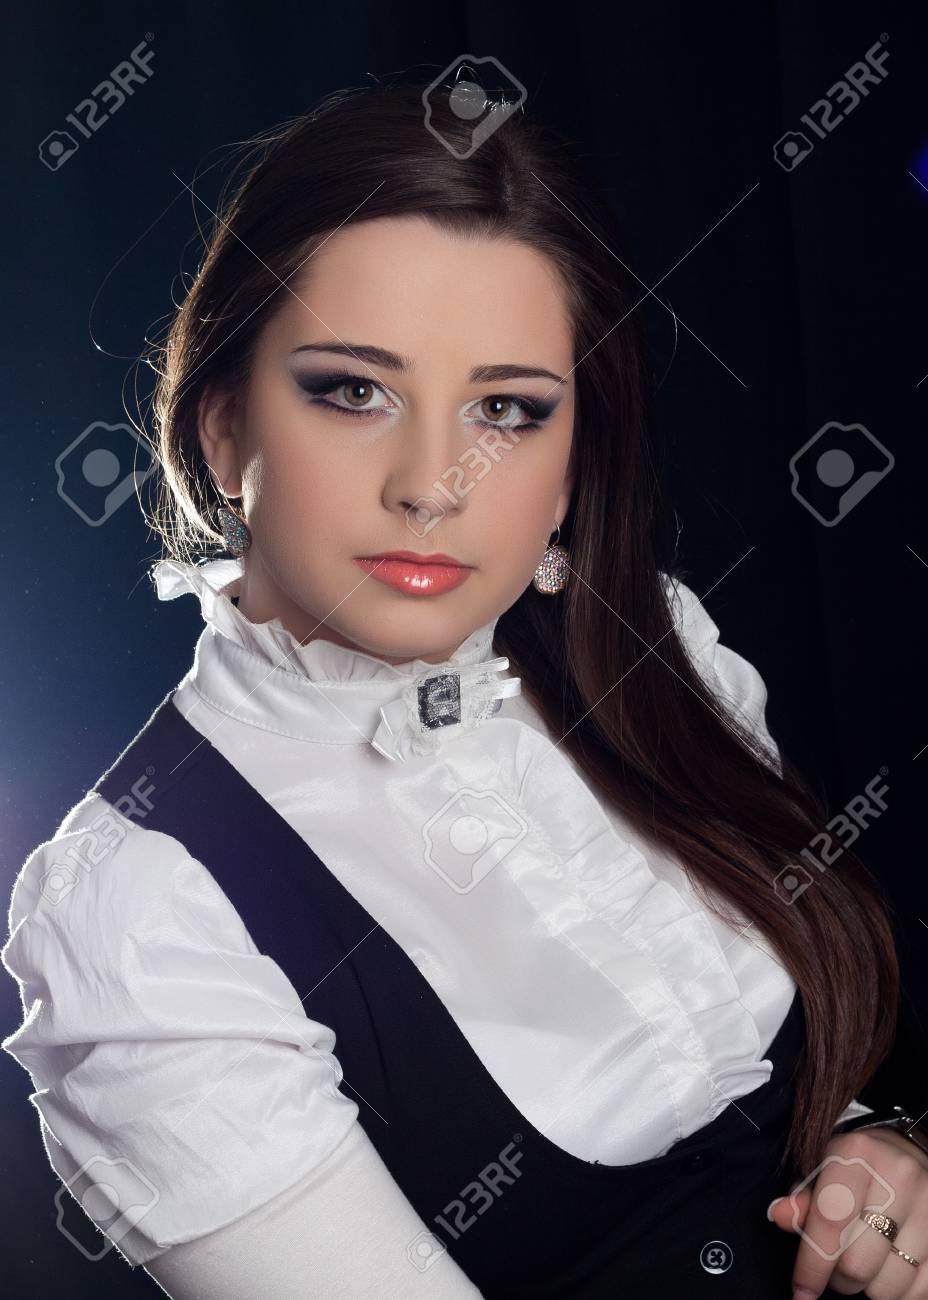 beautifull brunette , shooting in the studio with dark background Stock Photo - 13639827